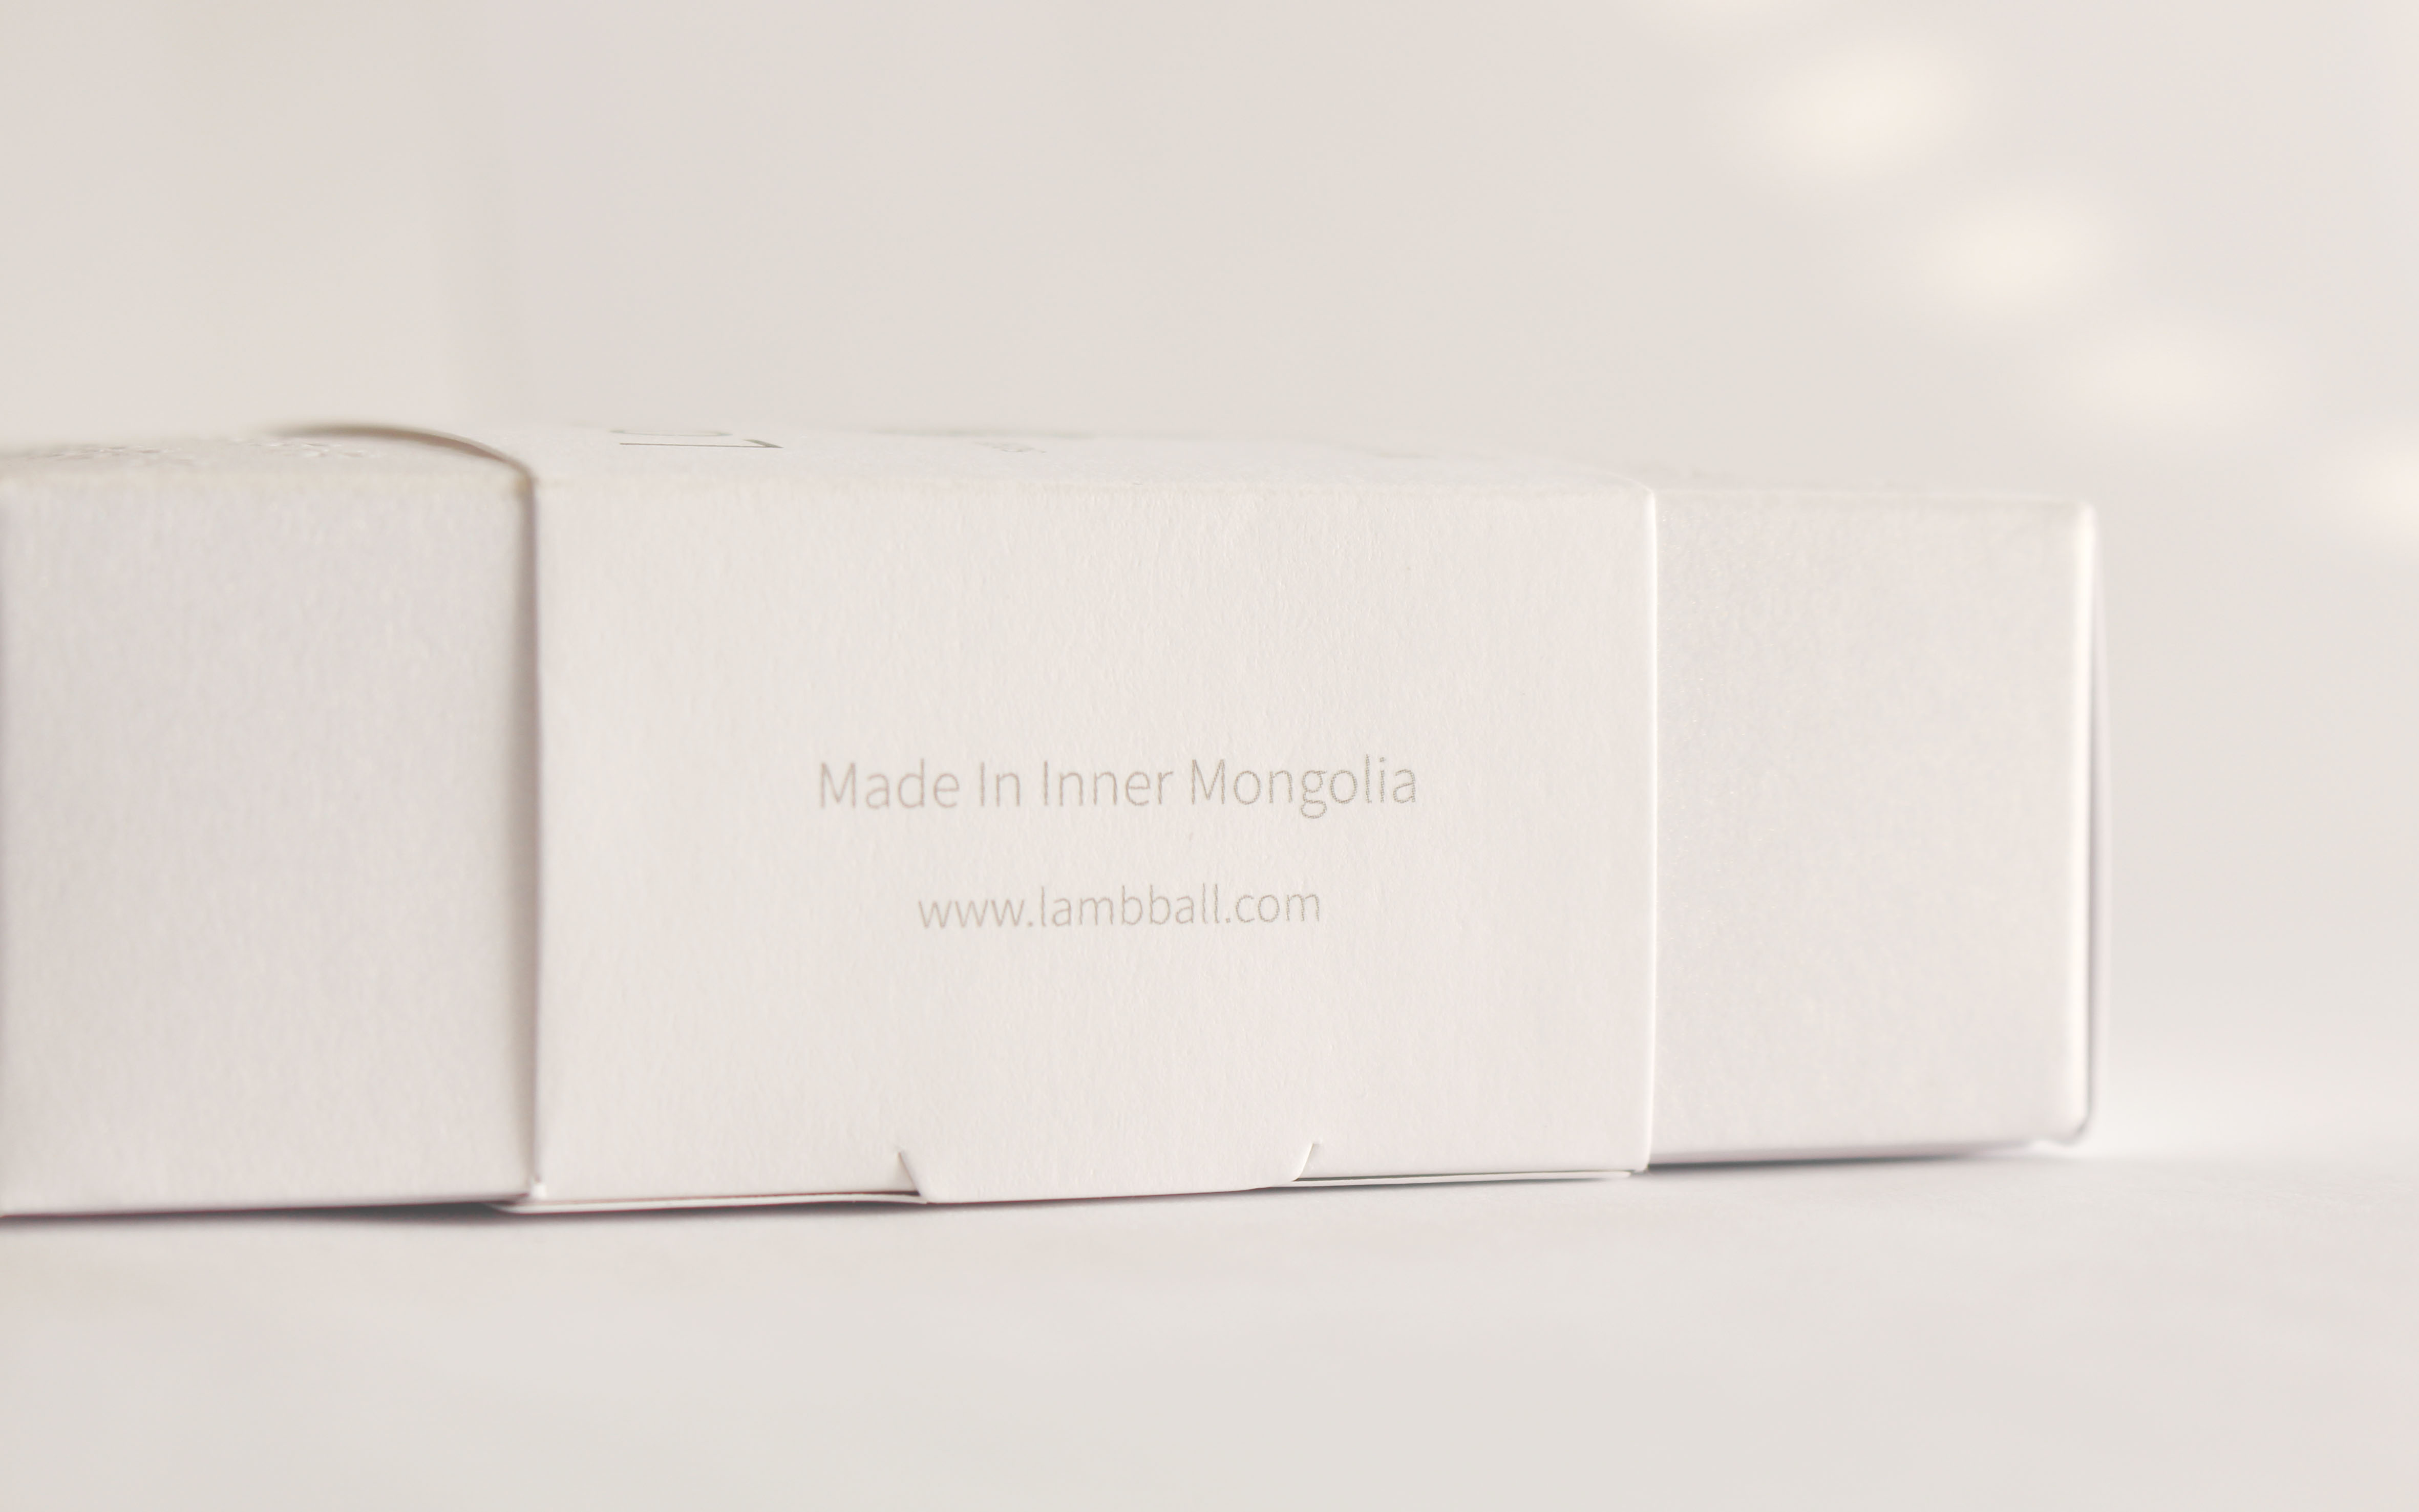 lambball羊脂皂包装设计 第6张 lambball羊脂皂包装设计 蒙古设计